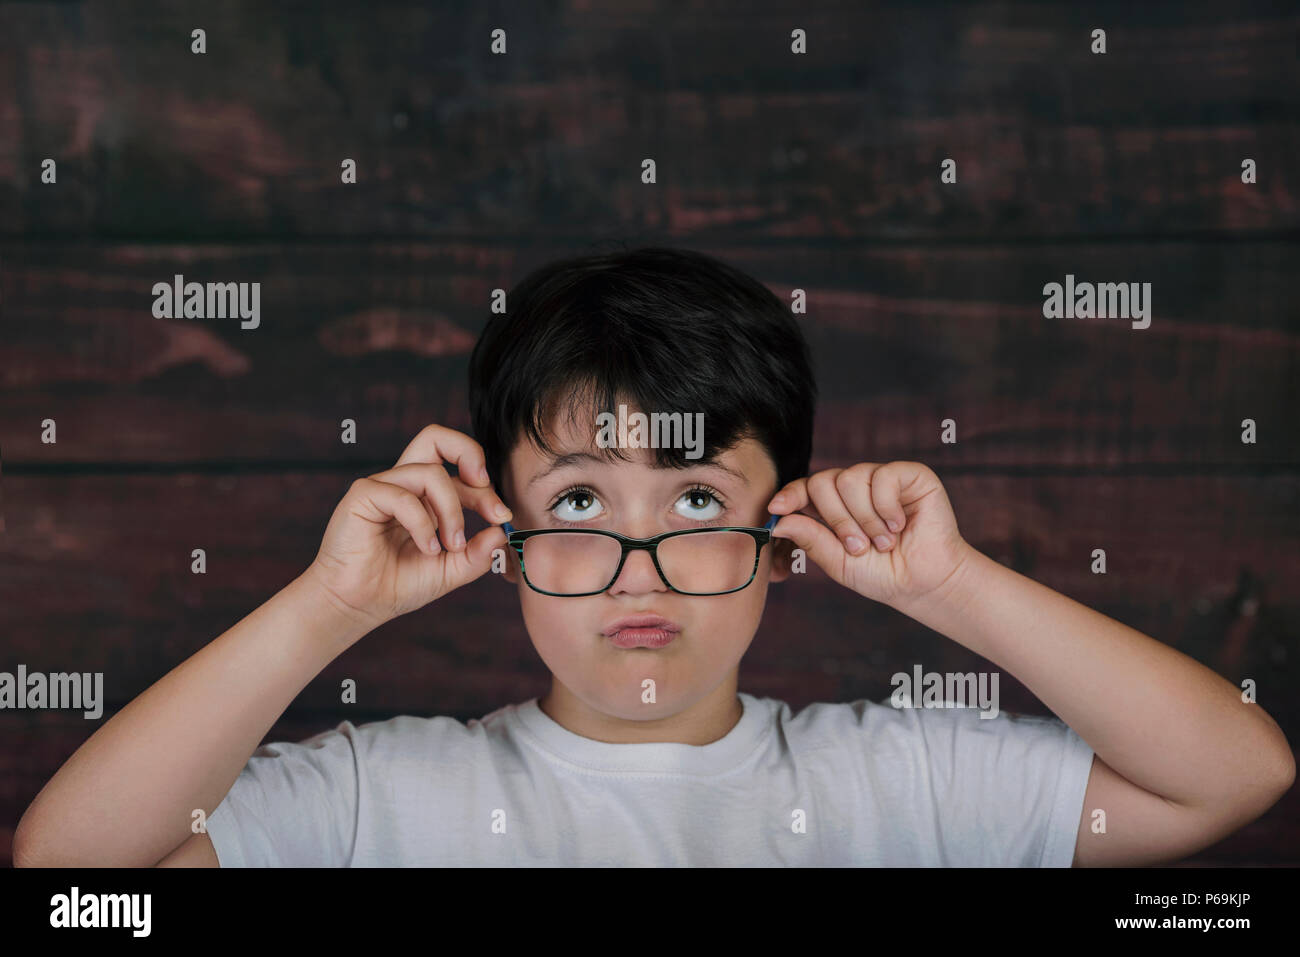 Niño con gafas de fondo de madera Imagen De Stock